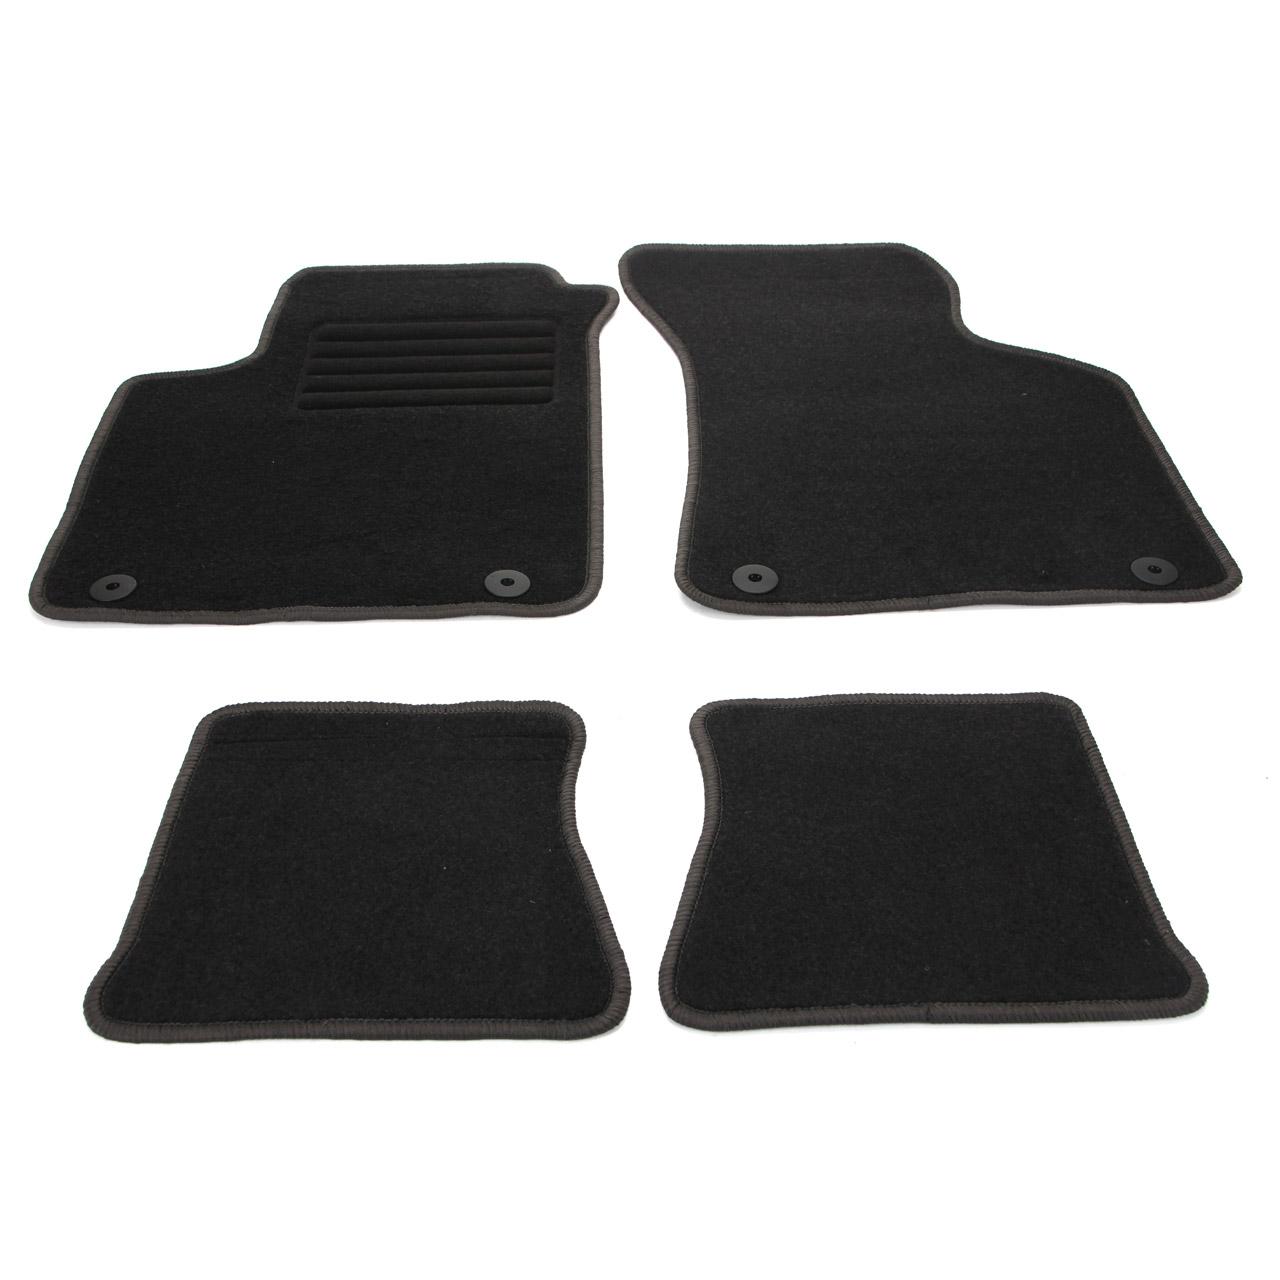 Veloursmatten Textilmatten Fußmatten AUDI TT TTS TTRS 8N Coupe Cabrio 2-tlg